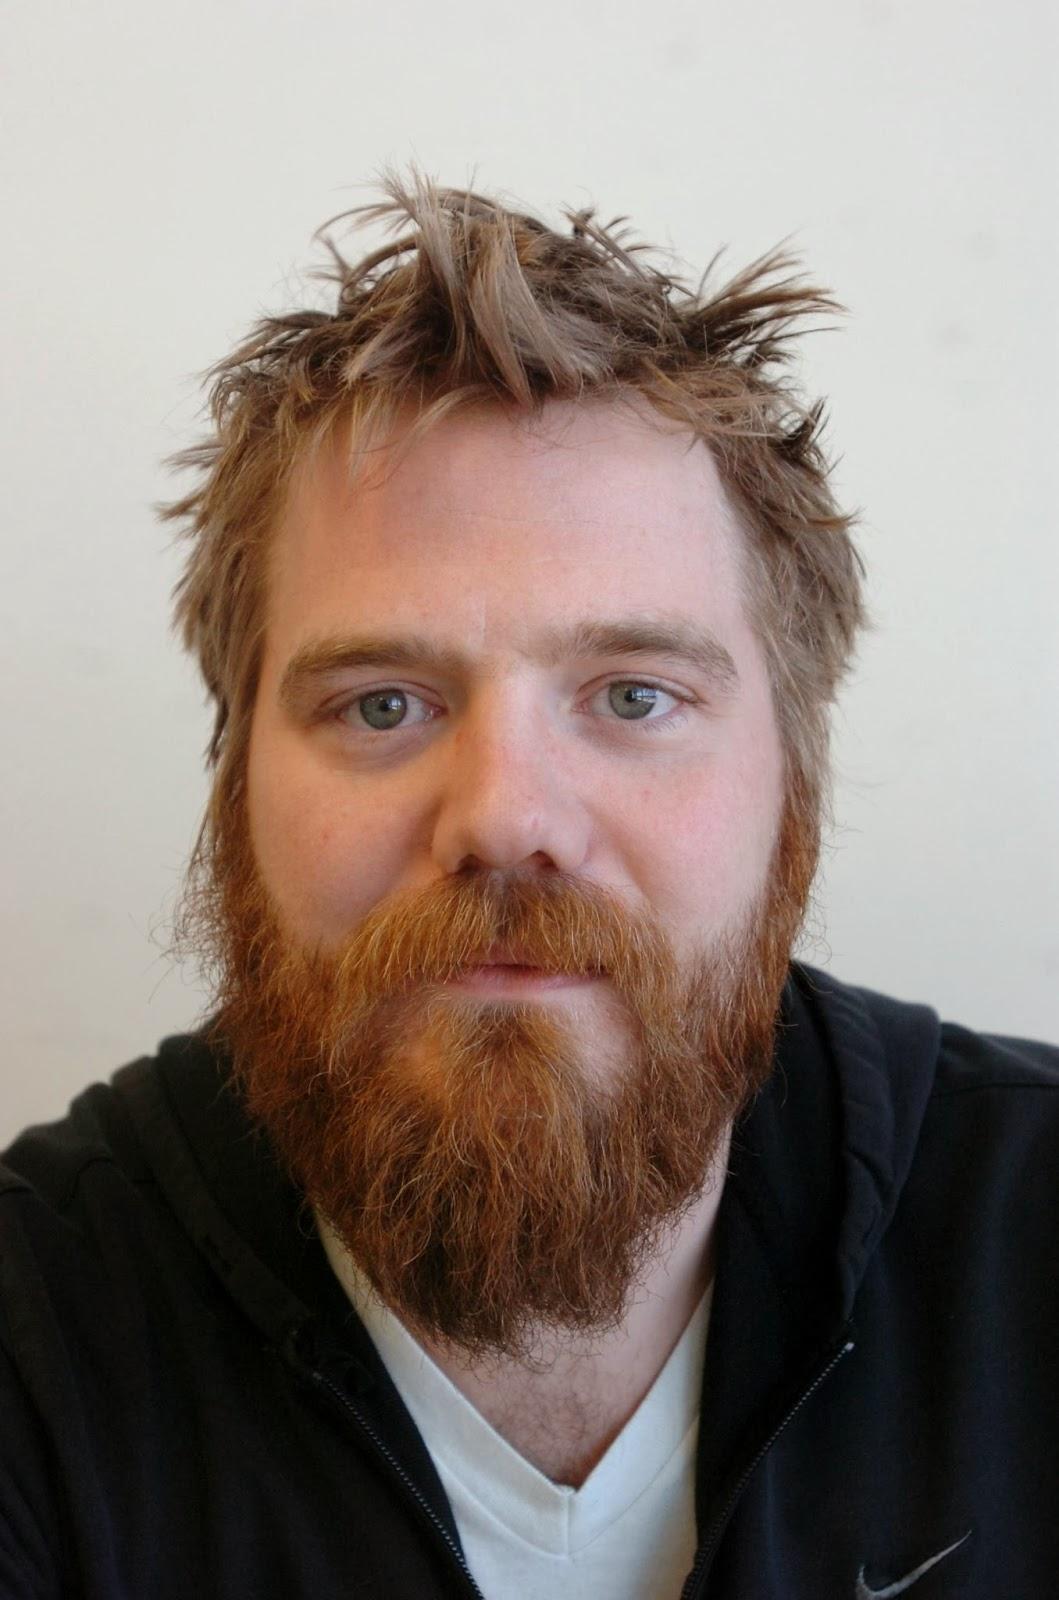 Ryan Dunn Hairstyles Men Hair Styles Collection